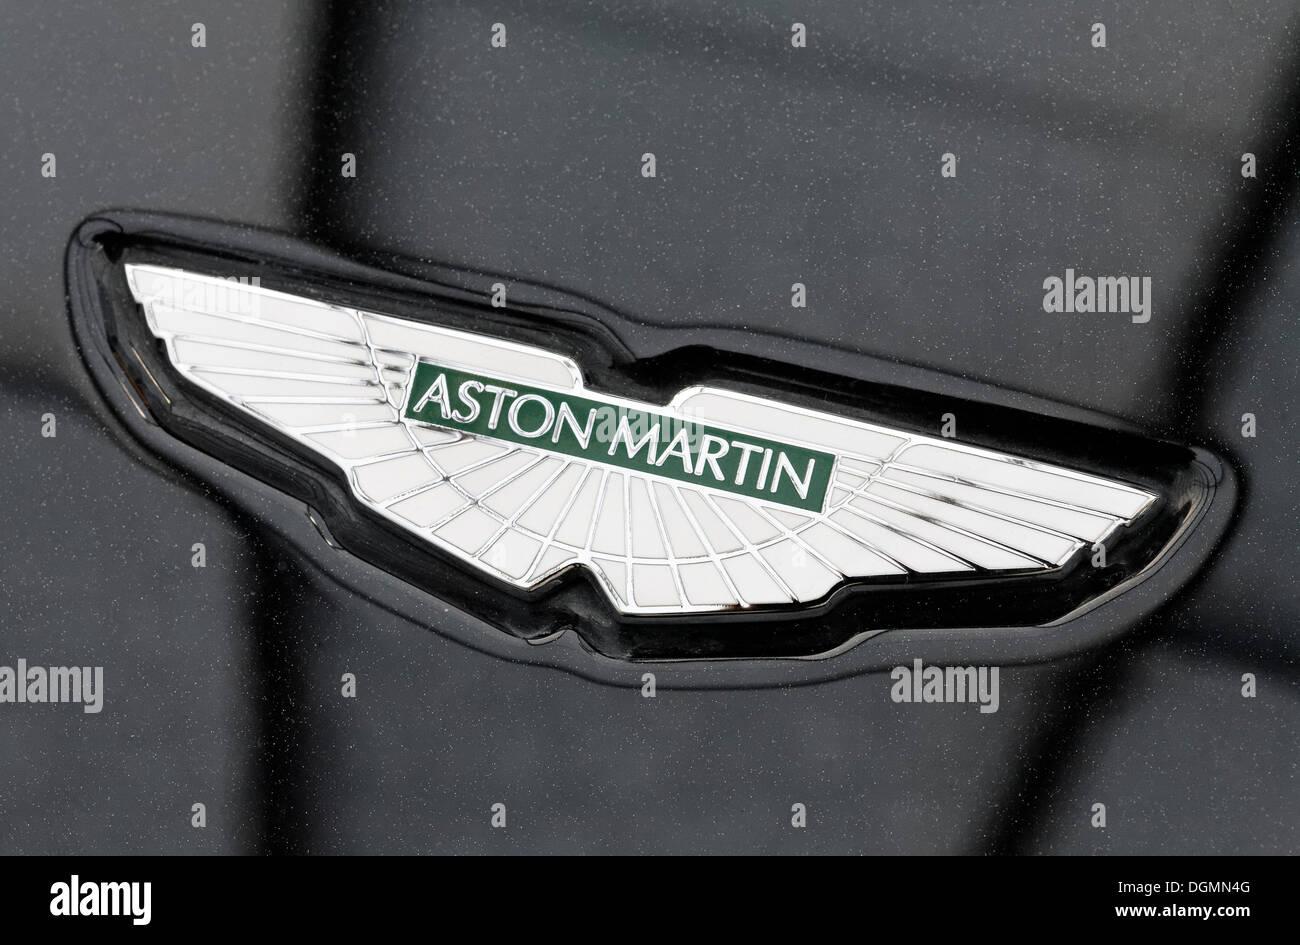 Aston Martin Logo On The Hood British Car Brand For Sports Cars